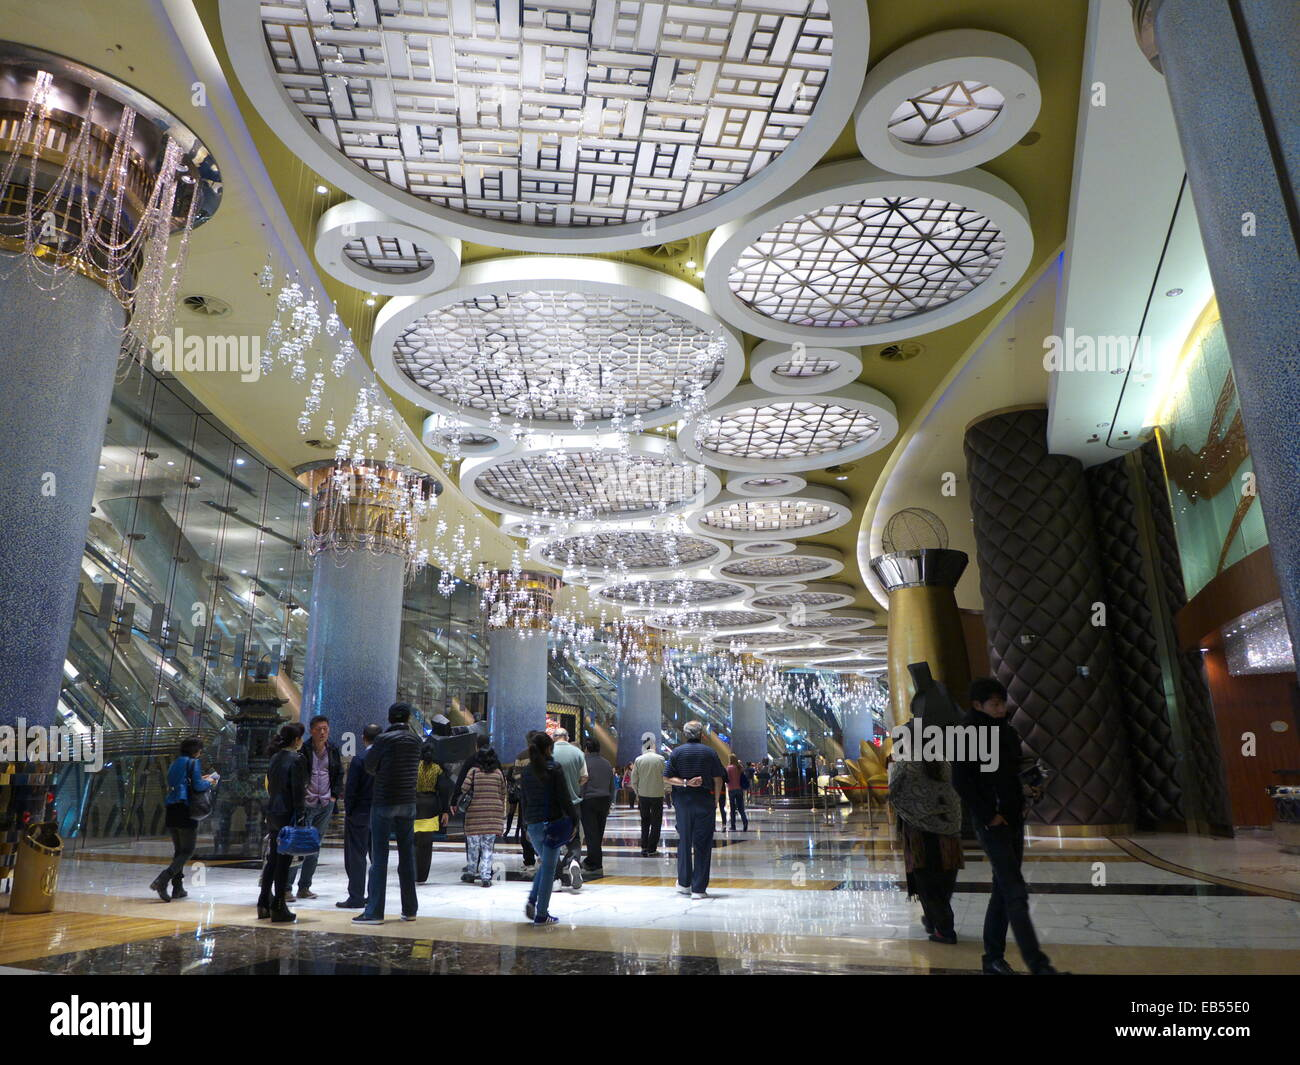 Cina Macao Casino Grand Lisboa Hotel lobby Immagini Stock